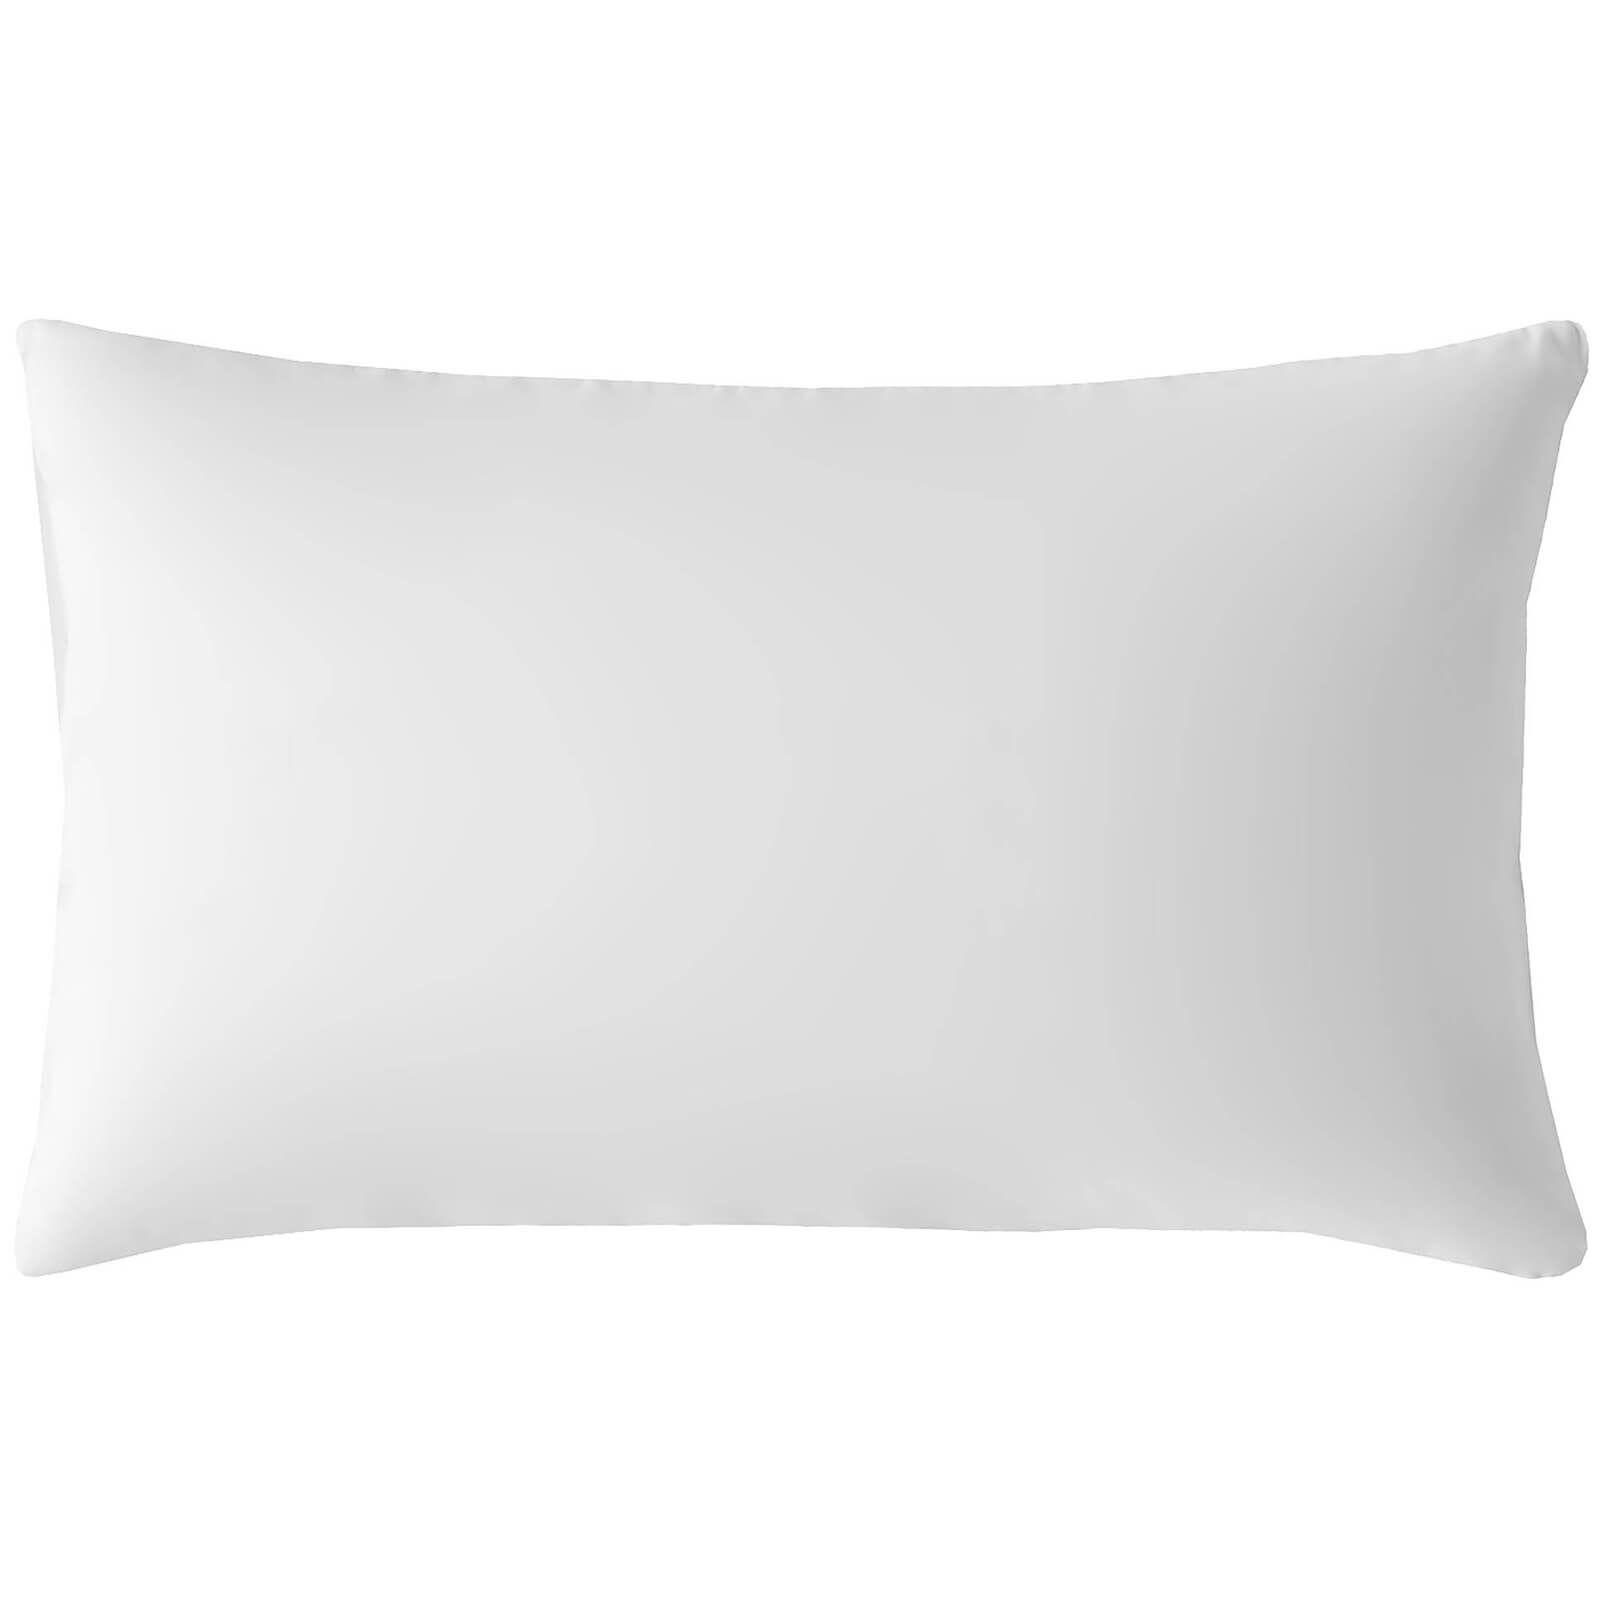 Kylie Minogue Bardot Pillowcase Pair